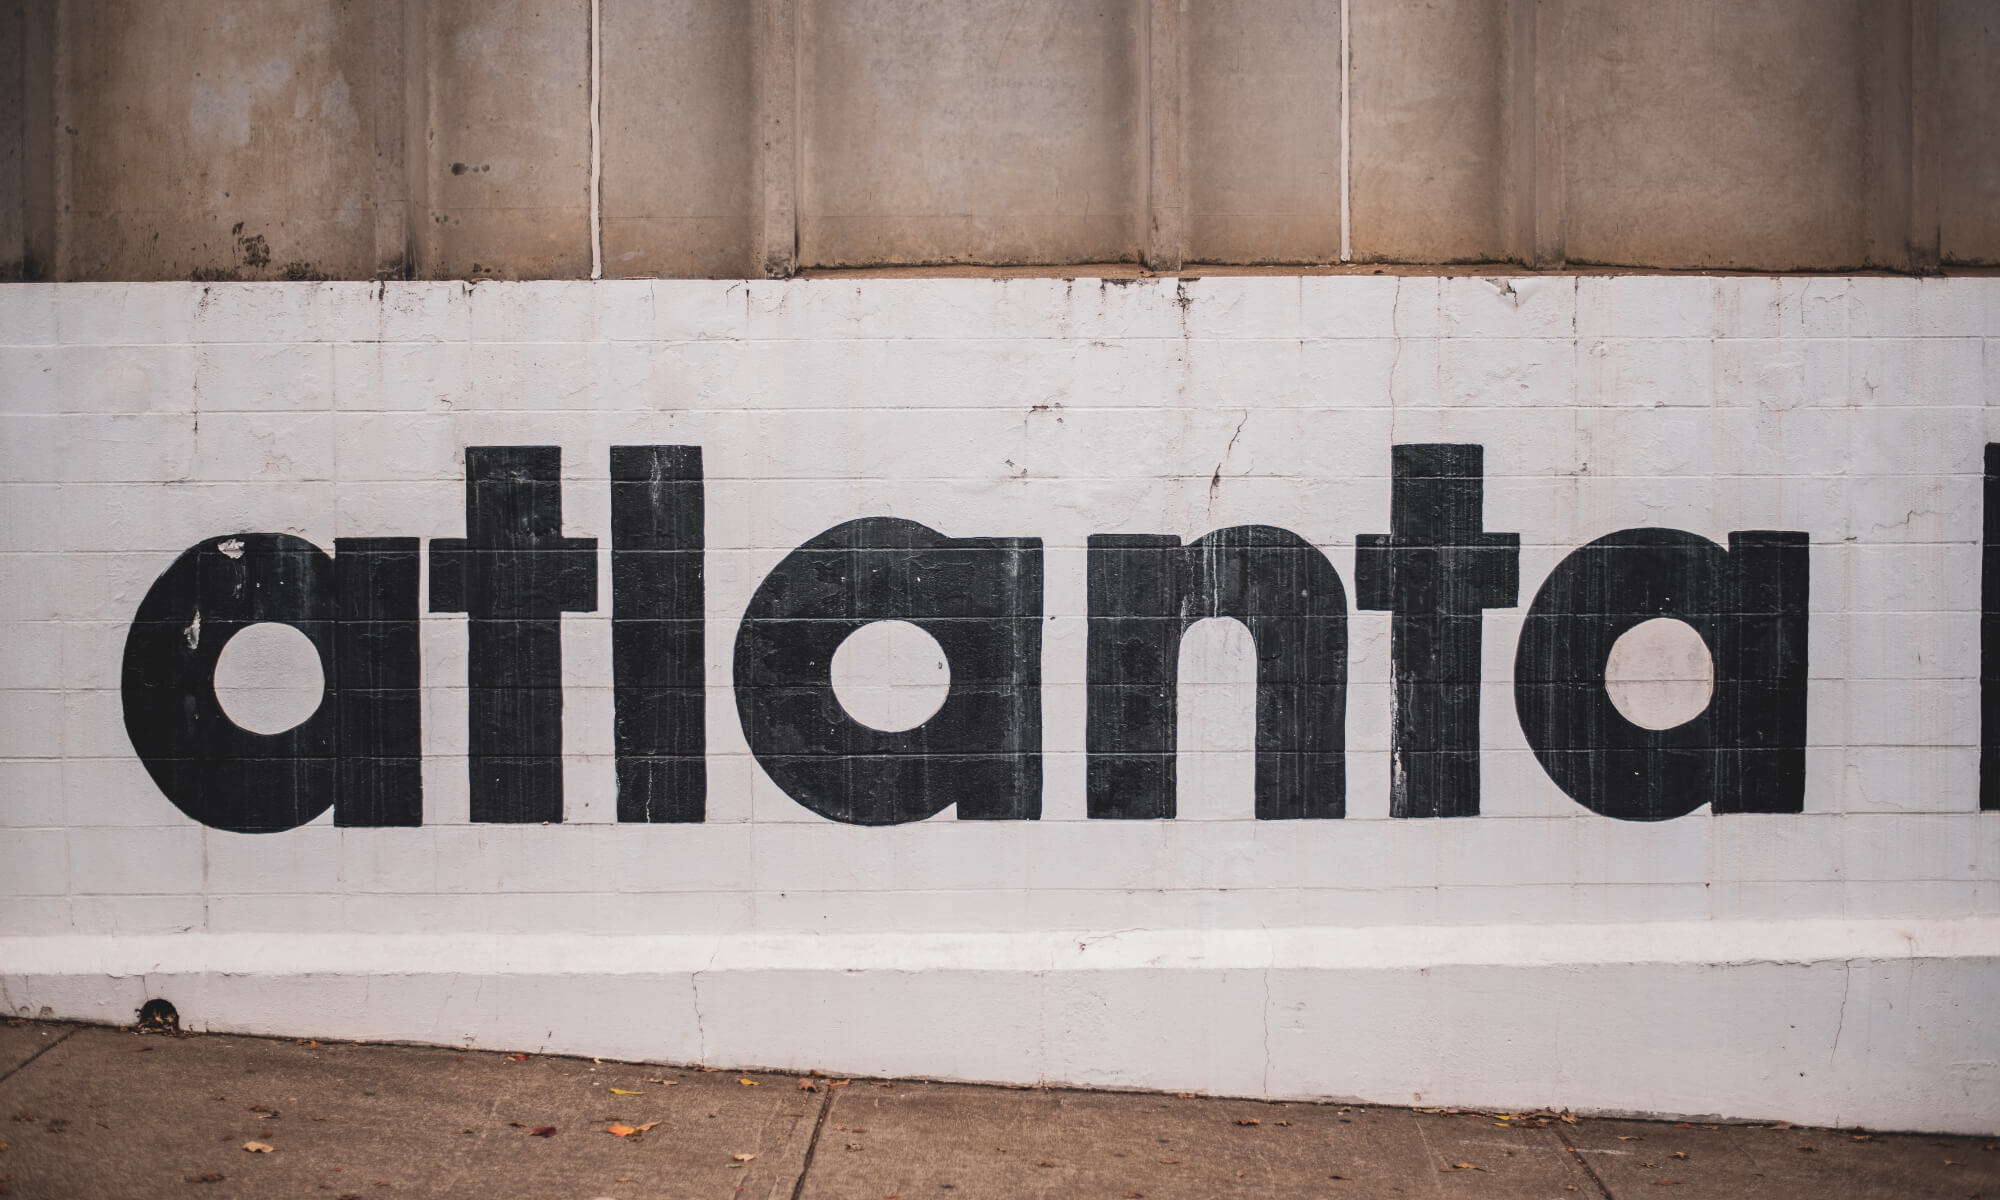 Atlanta sign in Atlanta, Georgia